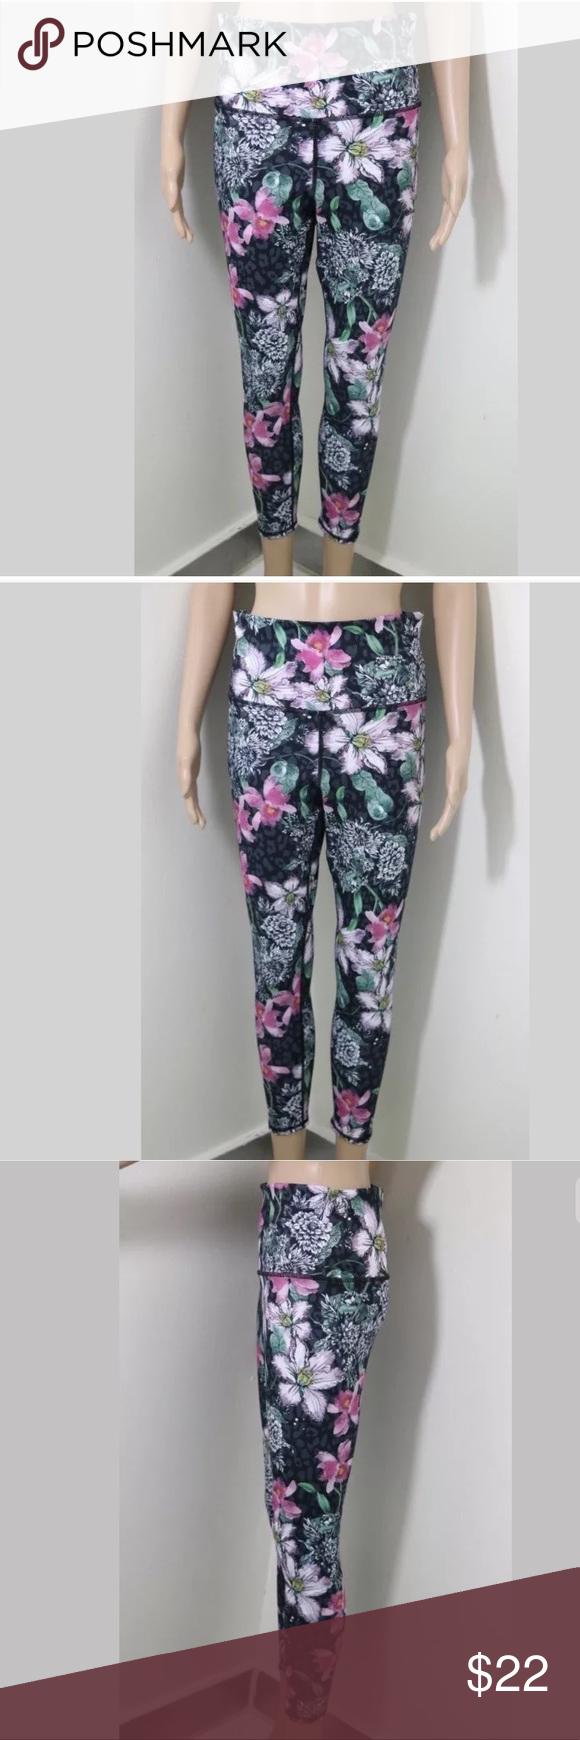 442fb83d4b9b2 EVCR Floral Leggings Tights Pants Sz M Purple Evolution and Creation EVCR  Womens Cropped Capri Yoga